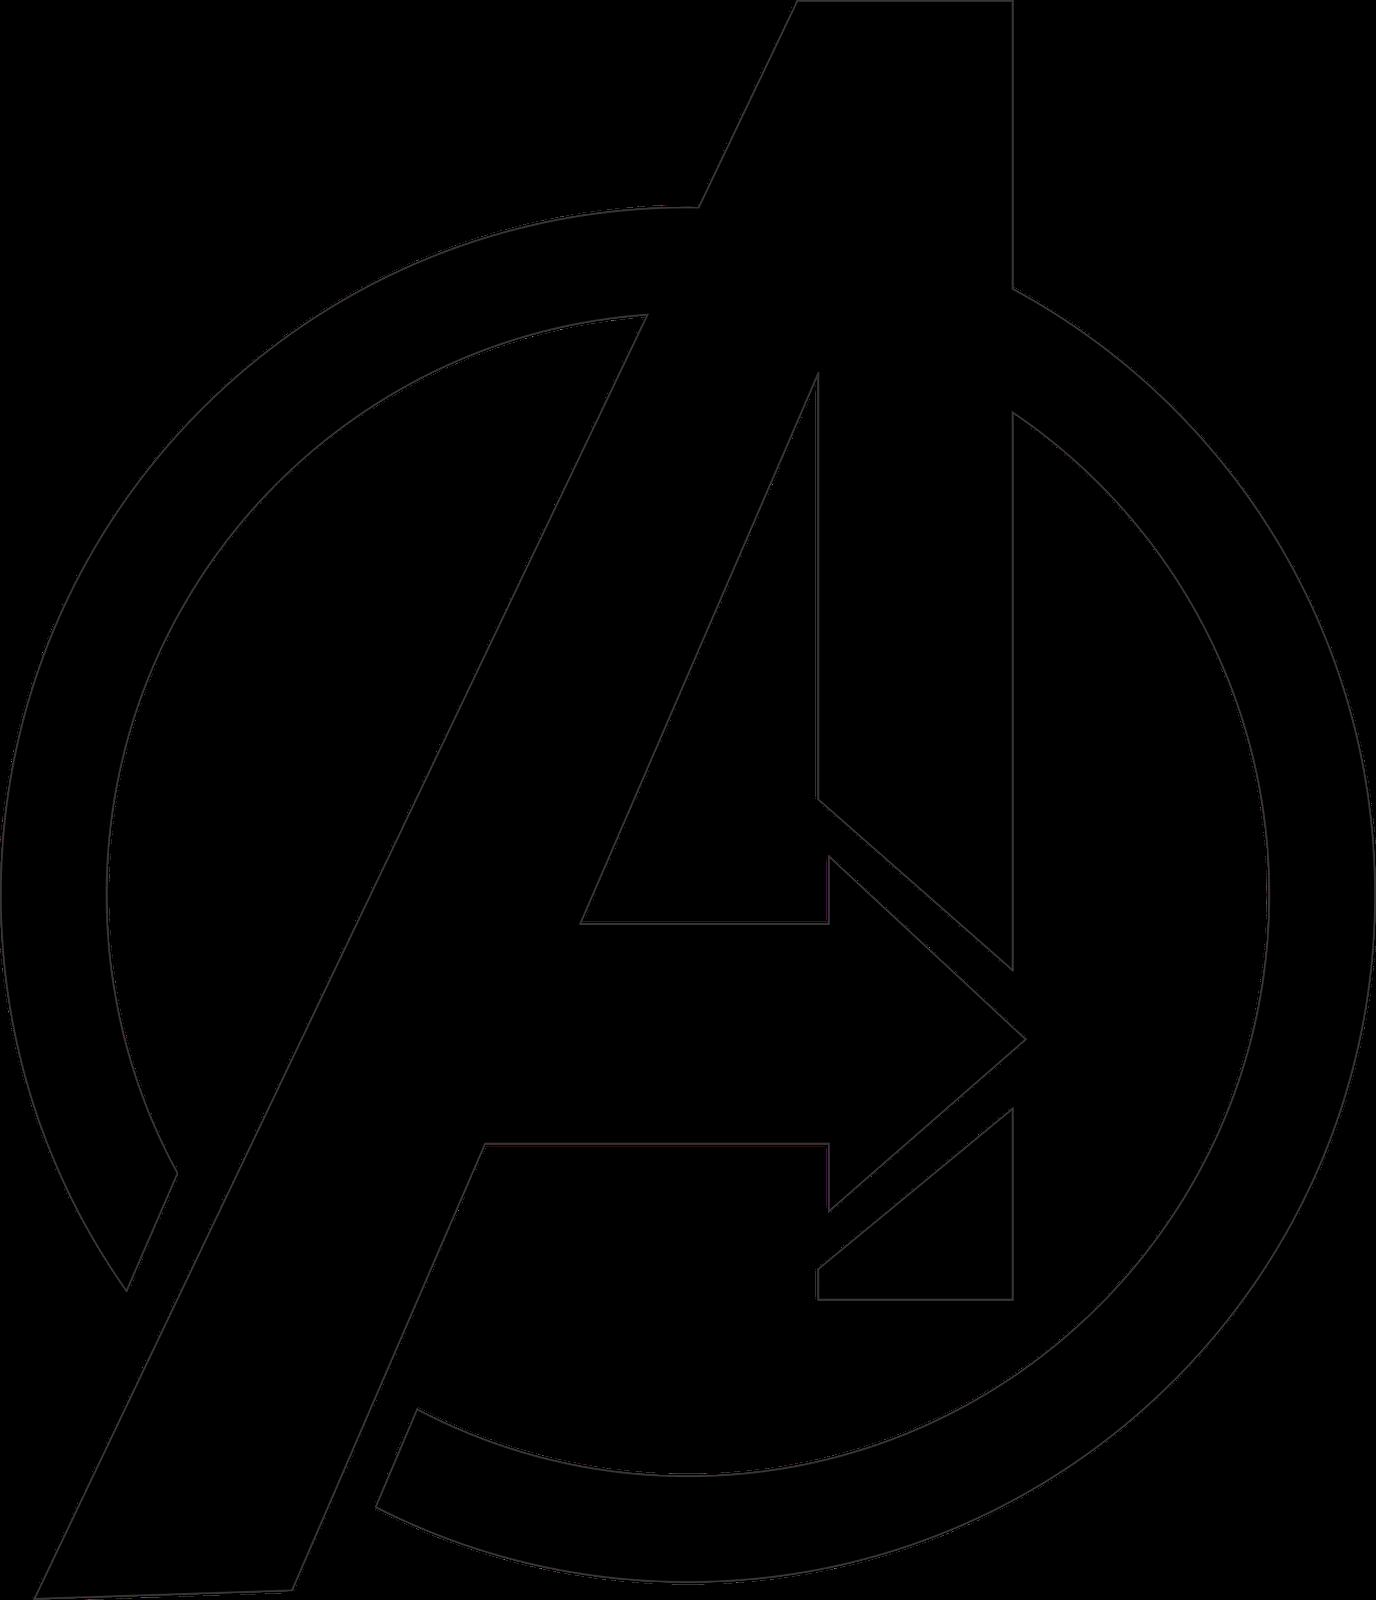 Marvel logo clipart